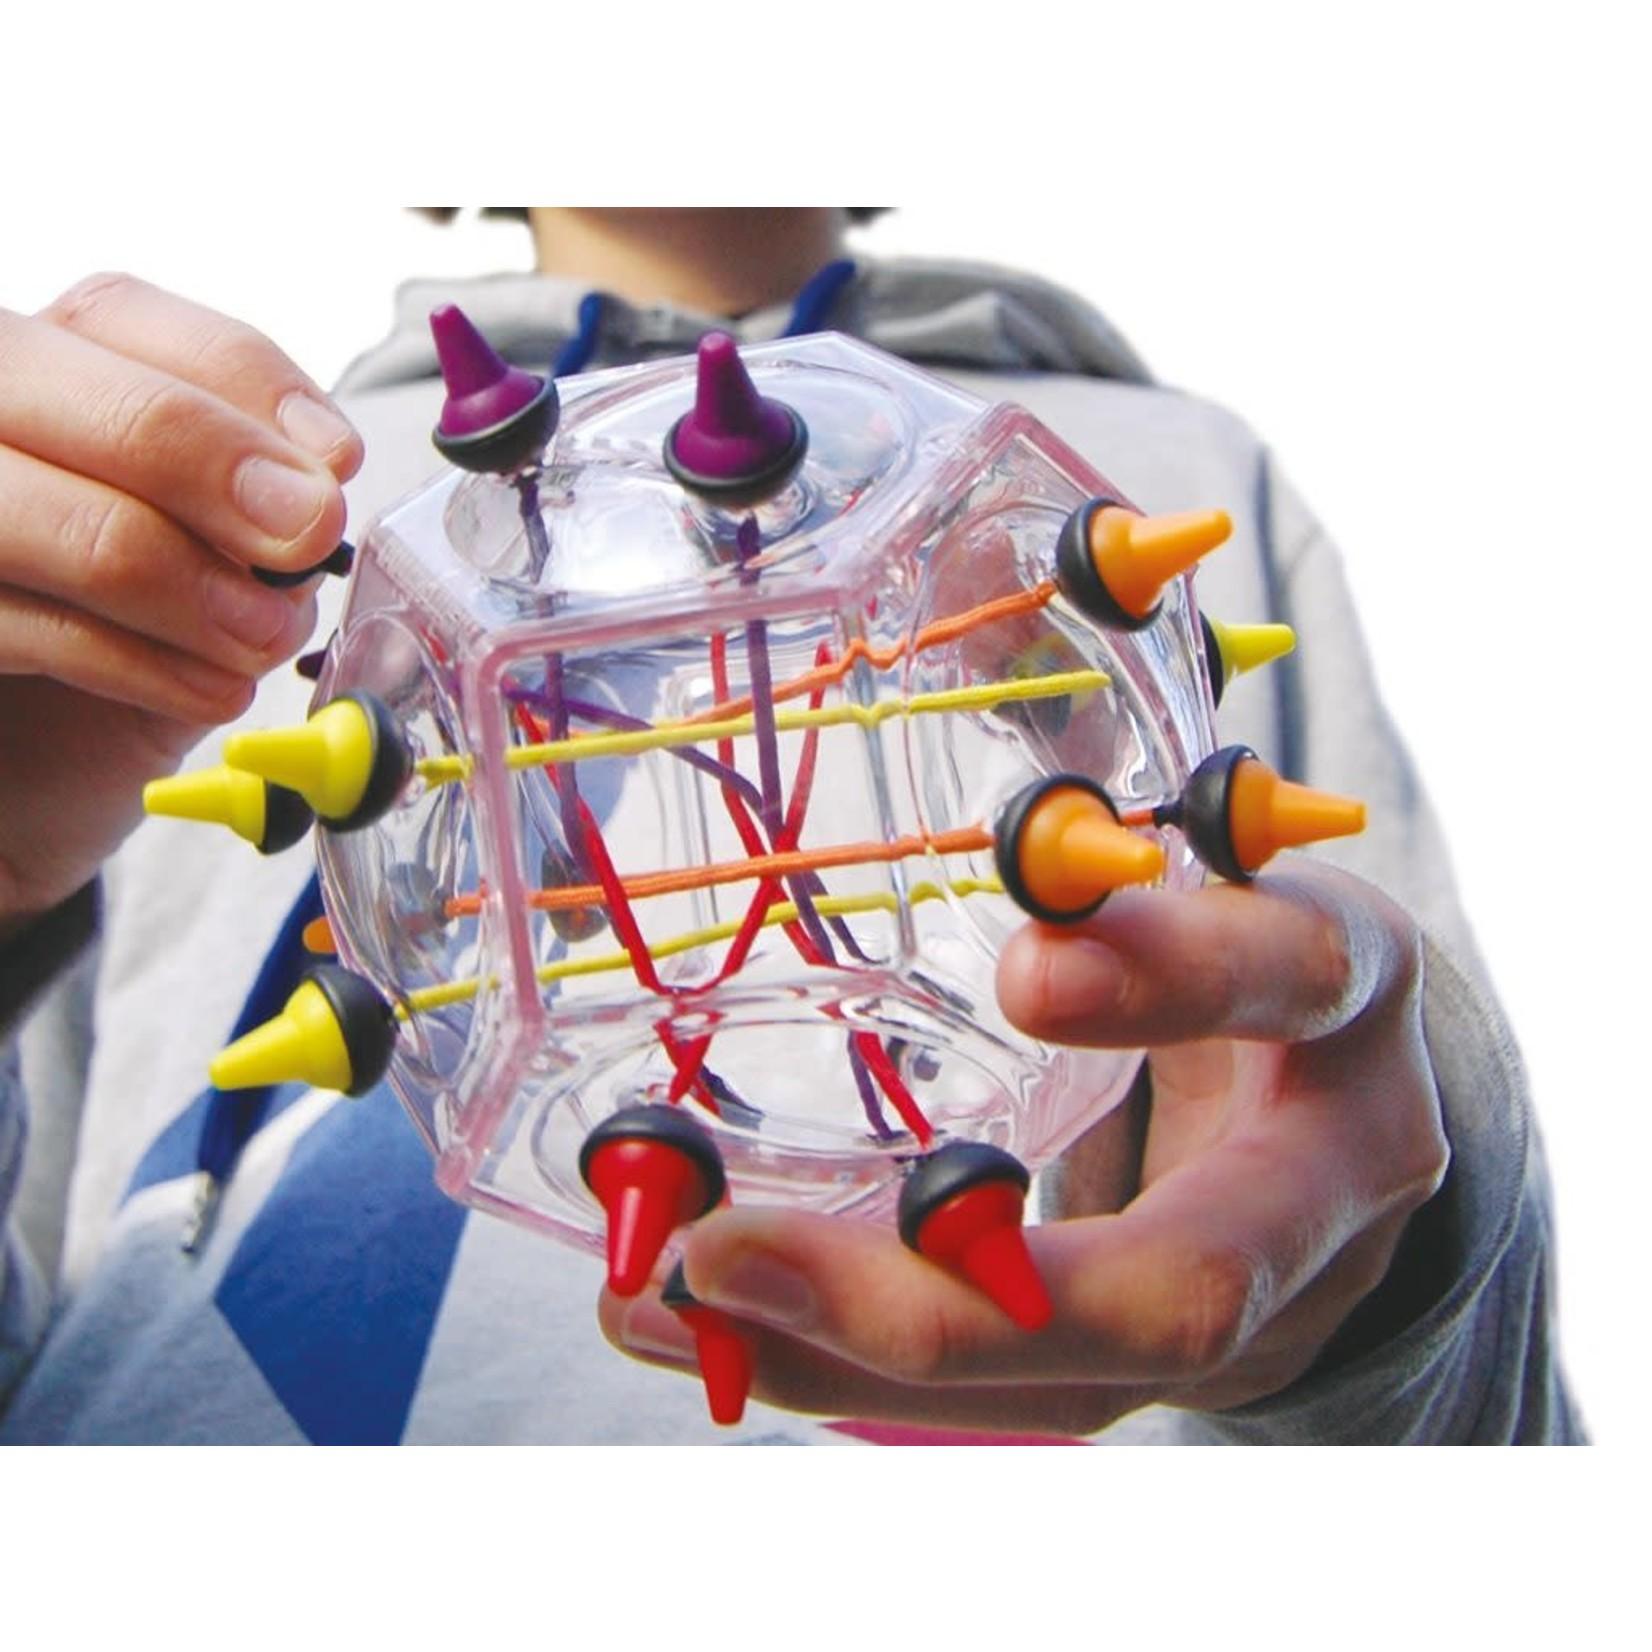 Recent Toys Brainstring Advanced